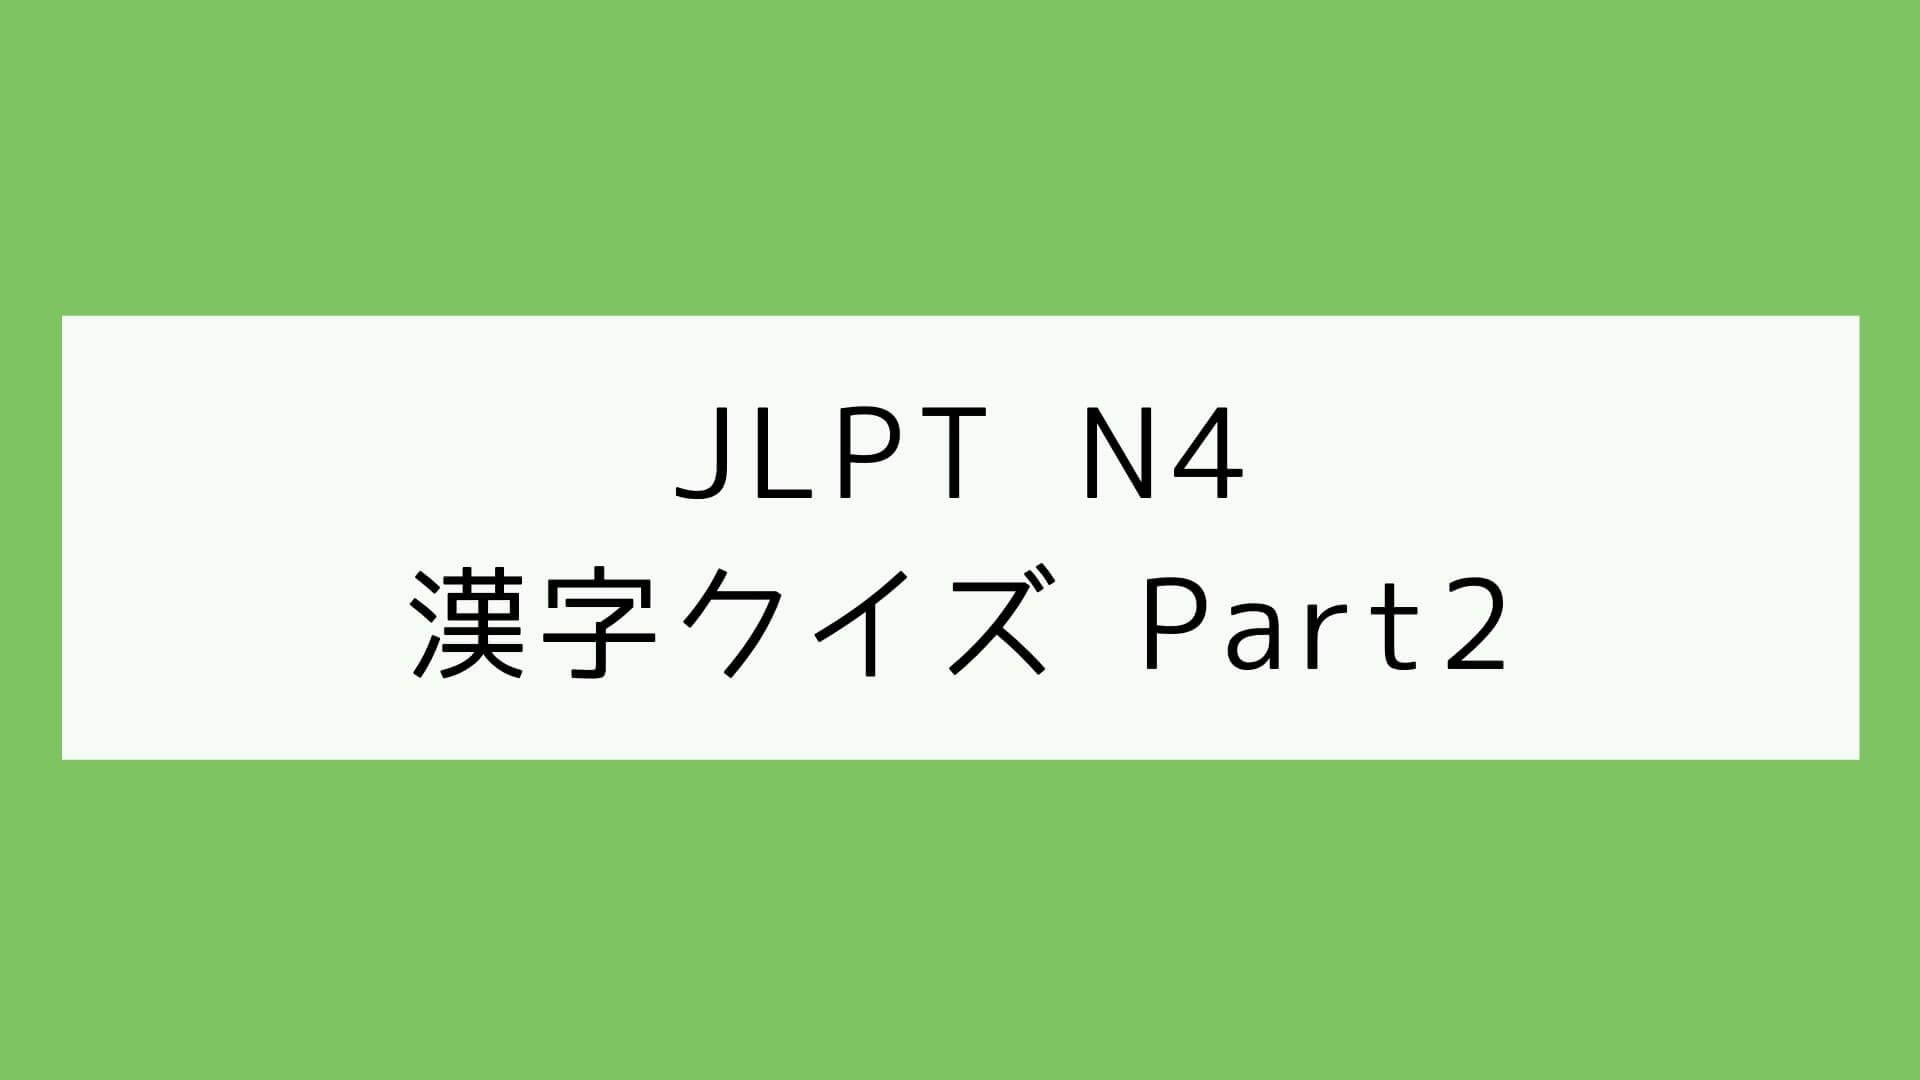 【JLPT N4】漢字クイズ Part2